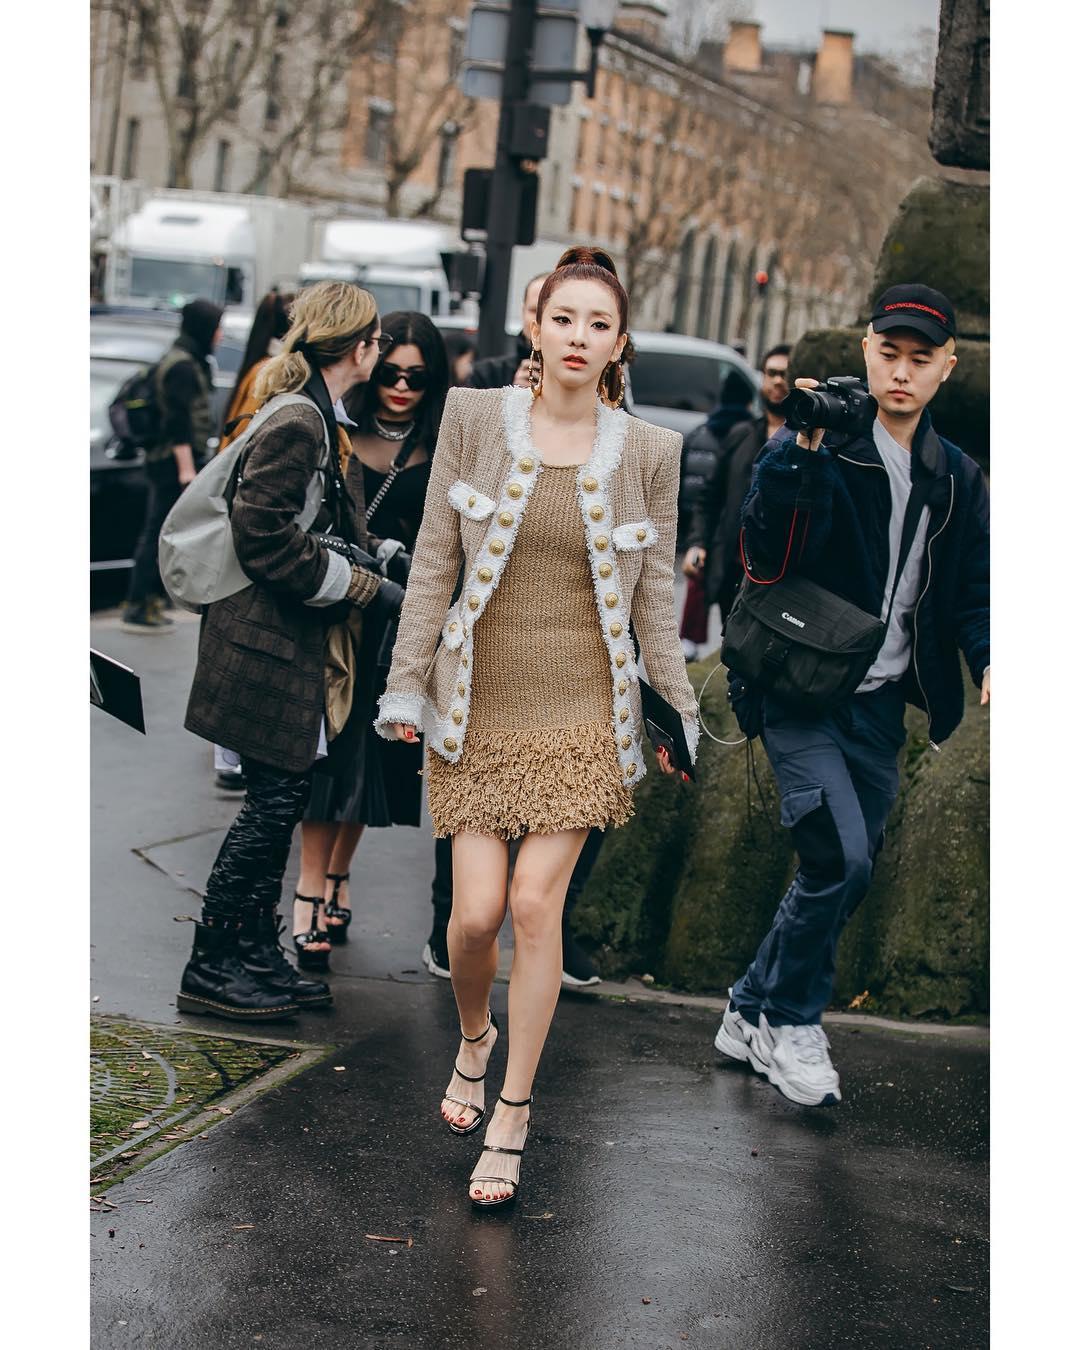 2NE1团魂不灭!朴春时隔8年再推个人专辑! Dara力挺友情出演新歌MV&成员近况大盘点!插图4